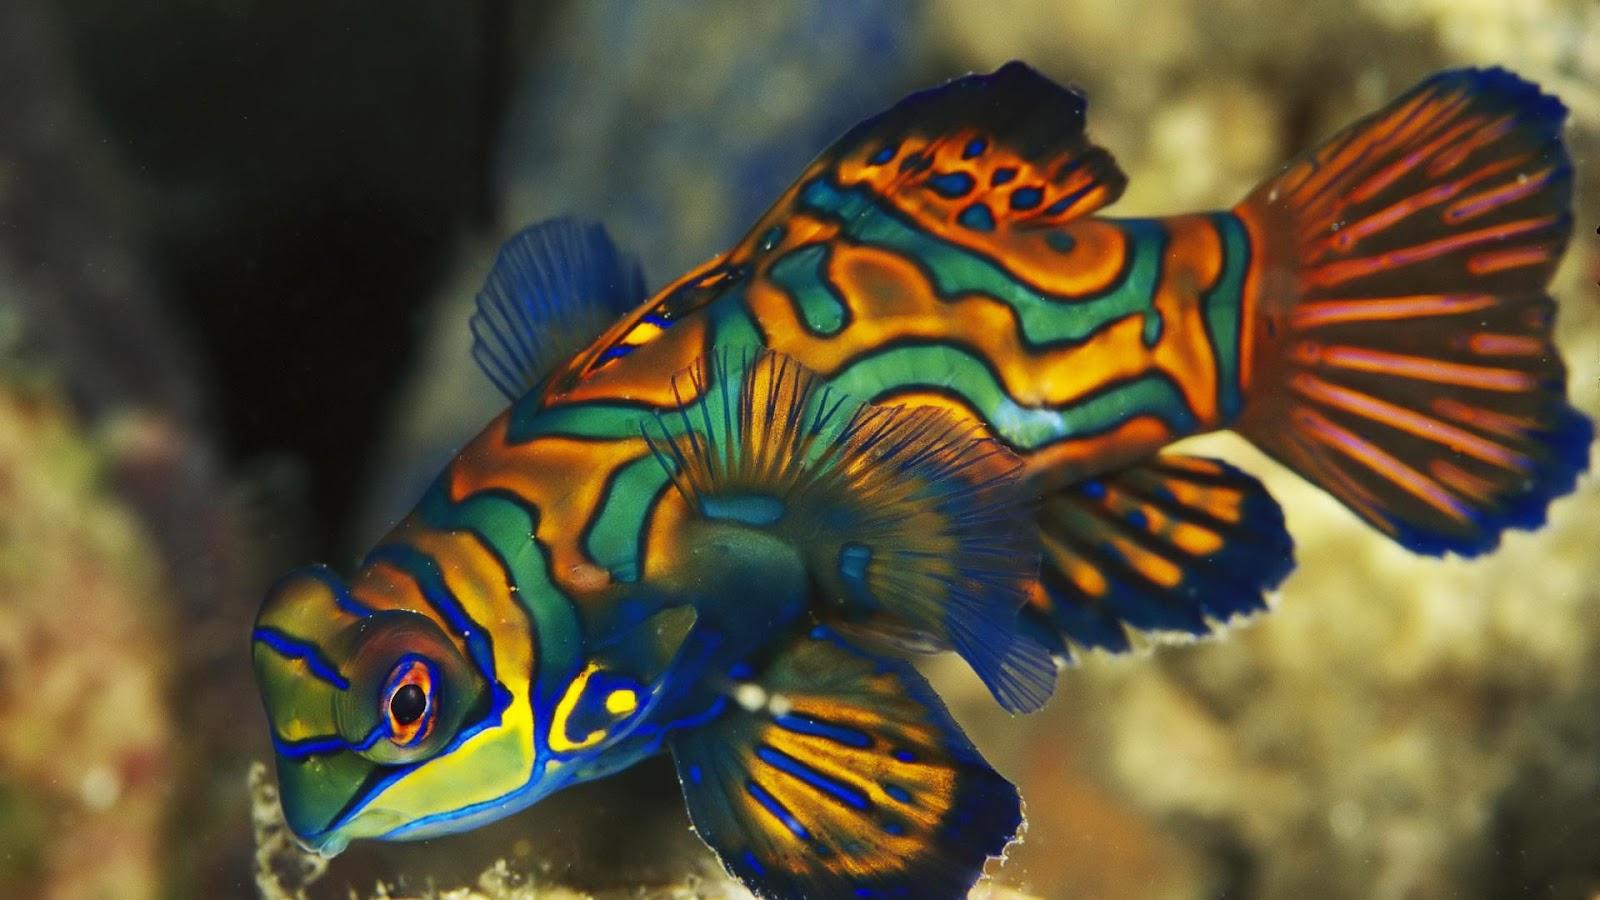 Dragonets Mandarin Fish Full HD Desktop Wallpapers 1080p